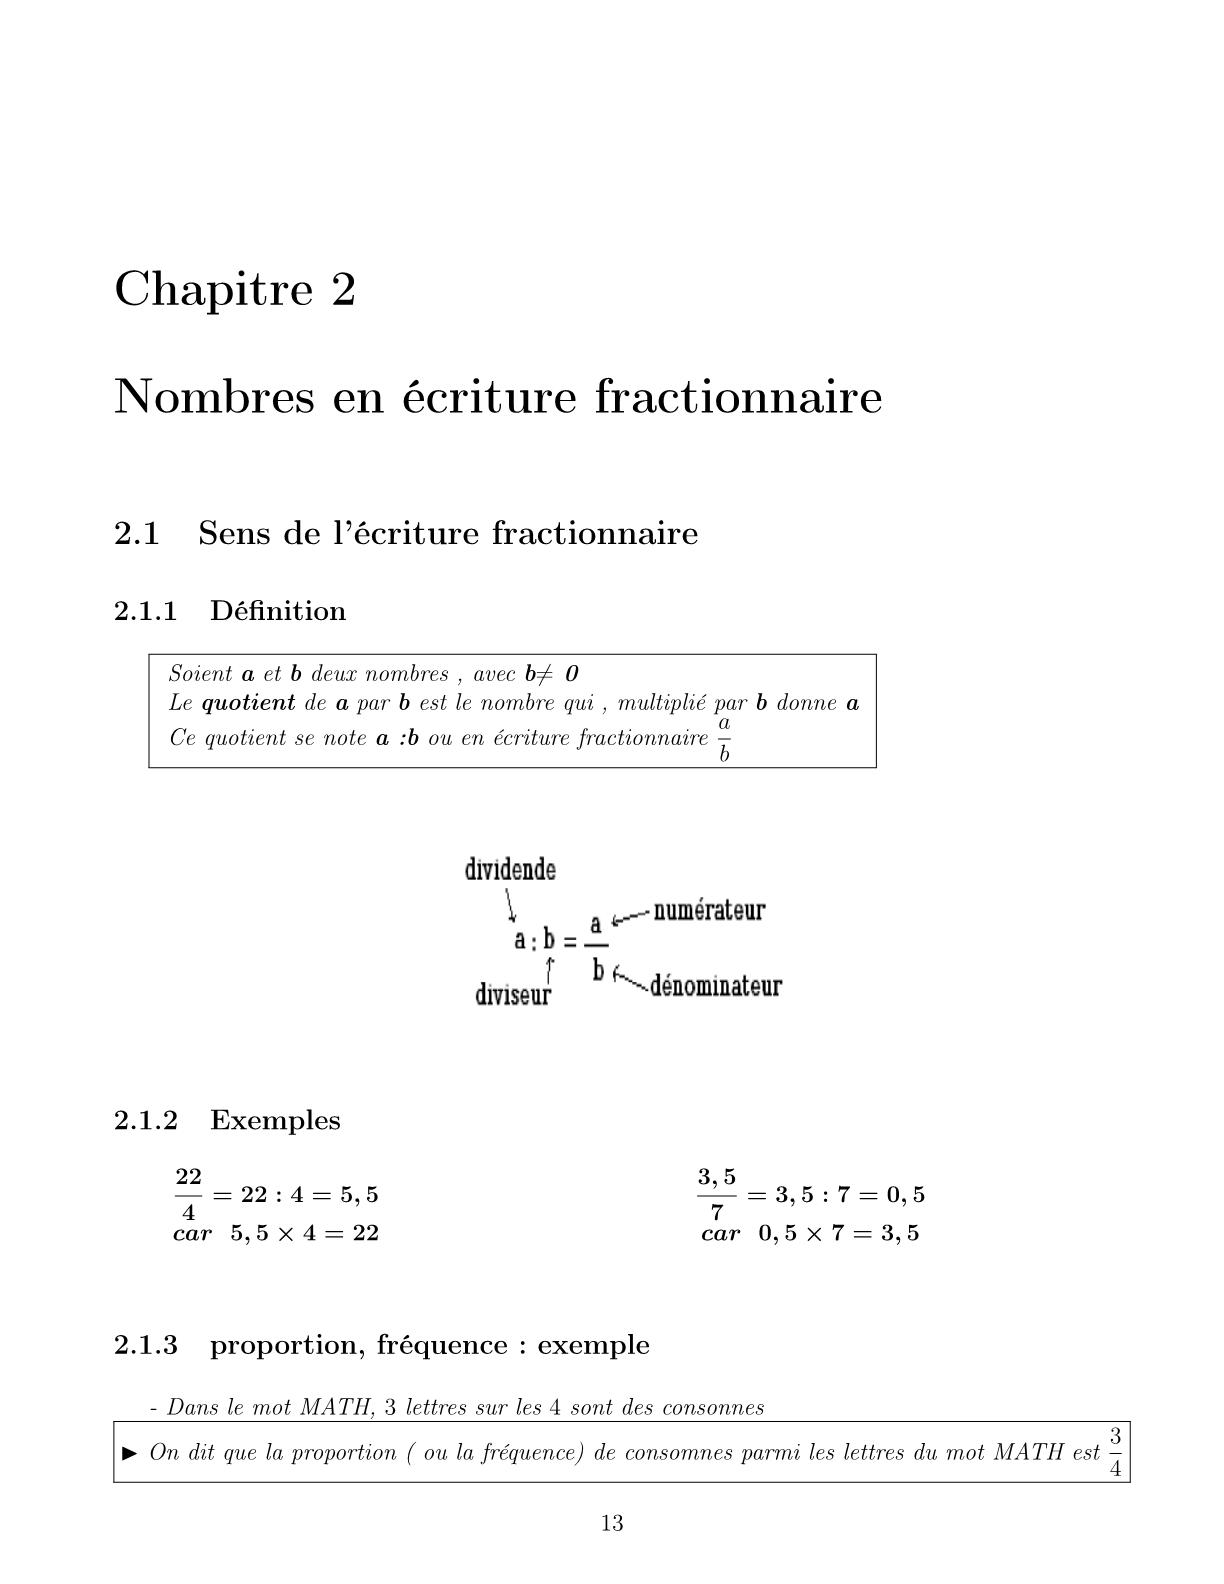 درس Nombre en écriture fractionnaire للسنة الأولى اعدادي